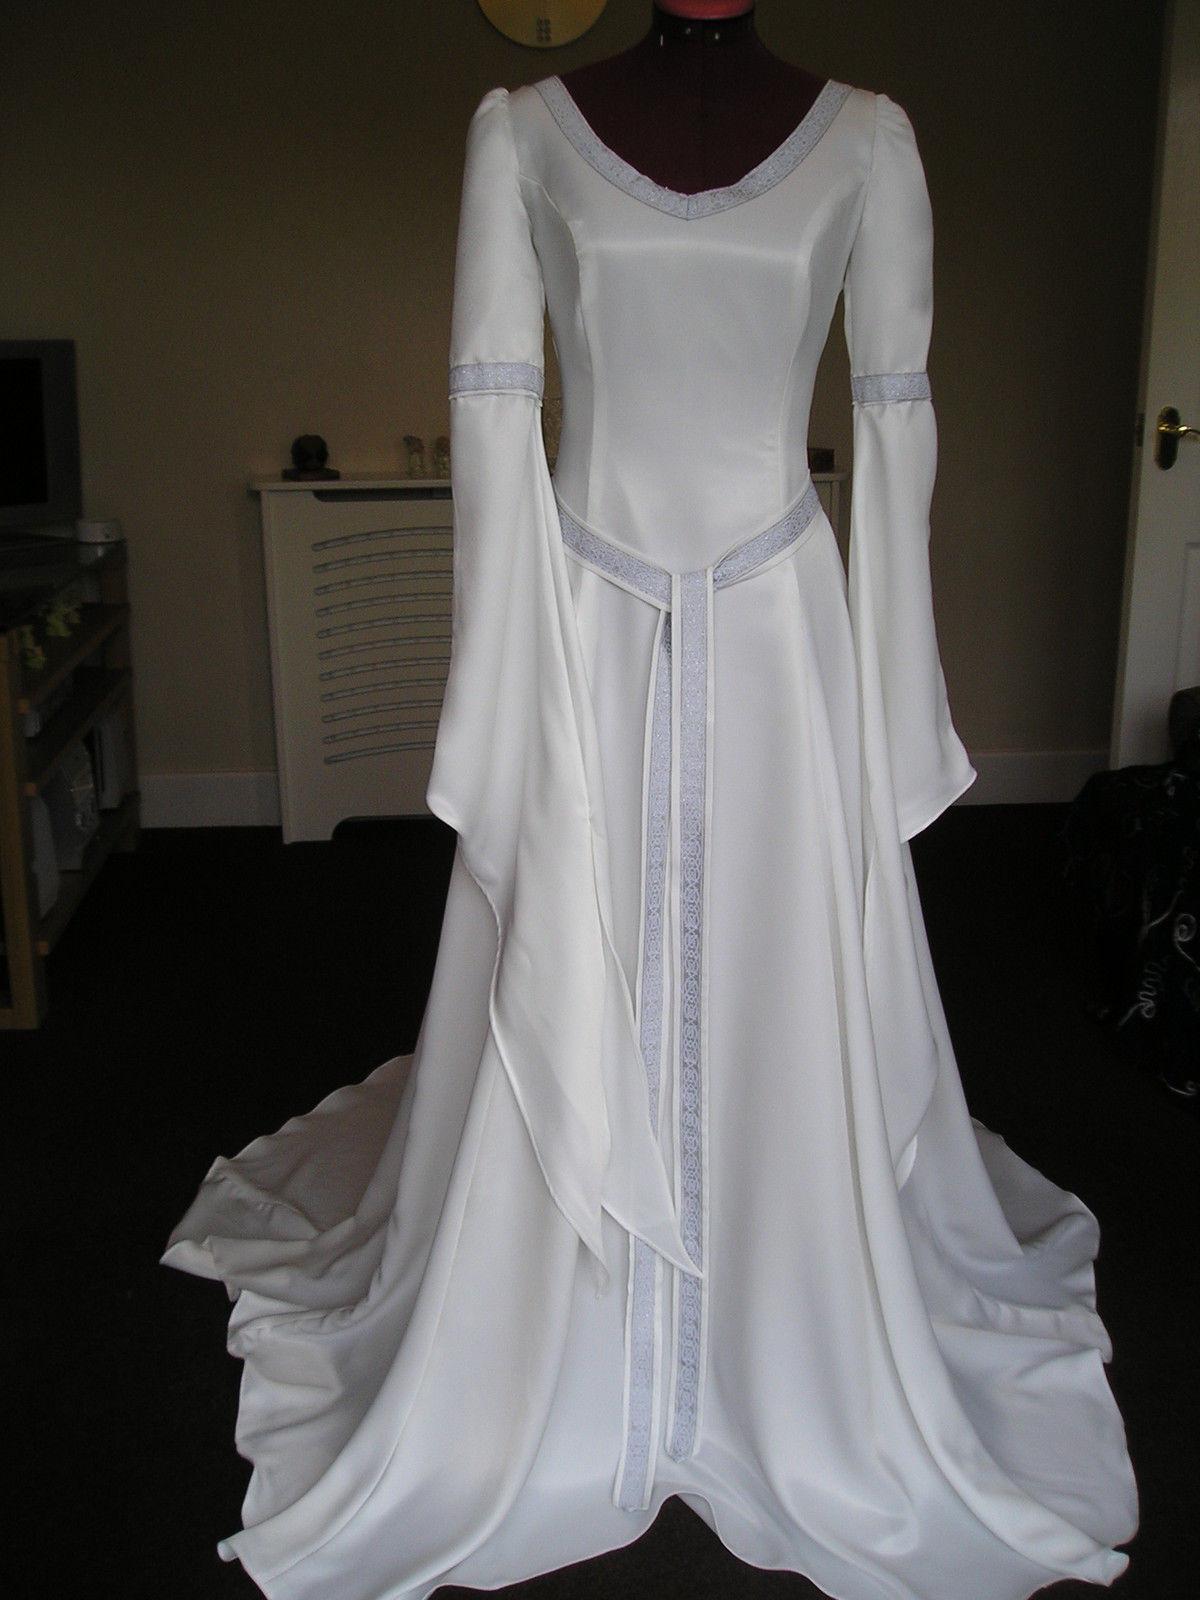 medieval wedding dresses for sale photo - 1